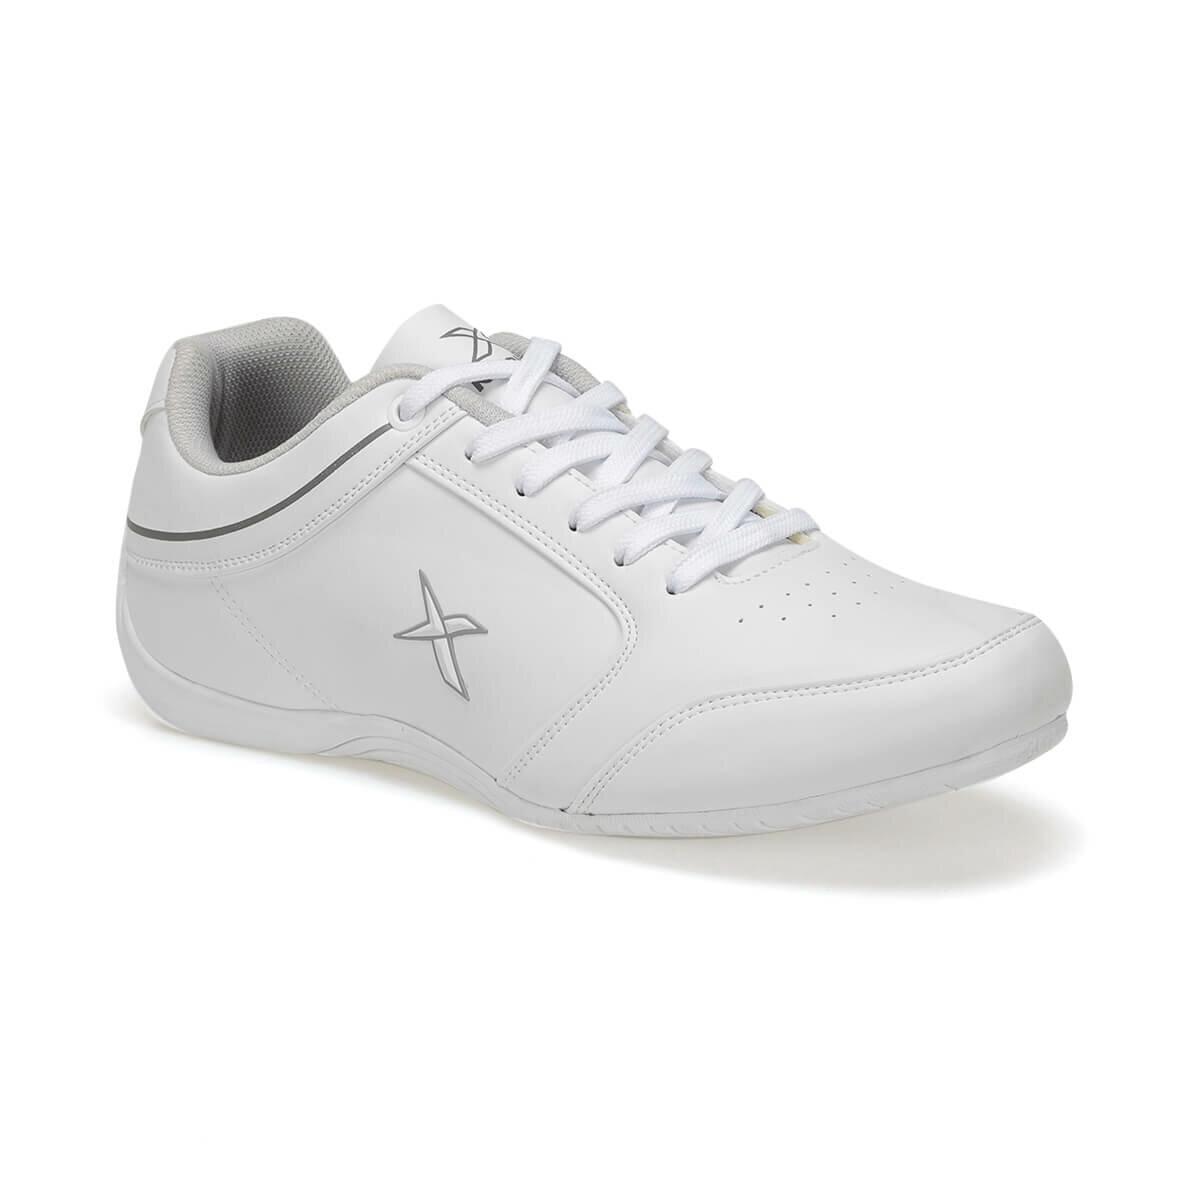 FLO Men Sneakers White Black Casual Sport Comfortable Fashion Durable Male Footwear Shoes Мужские кроссовки RONY M 9PR KINETIX